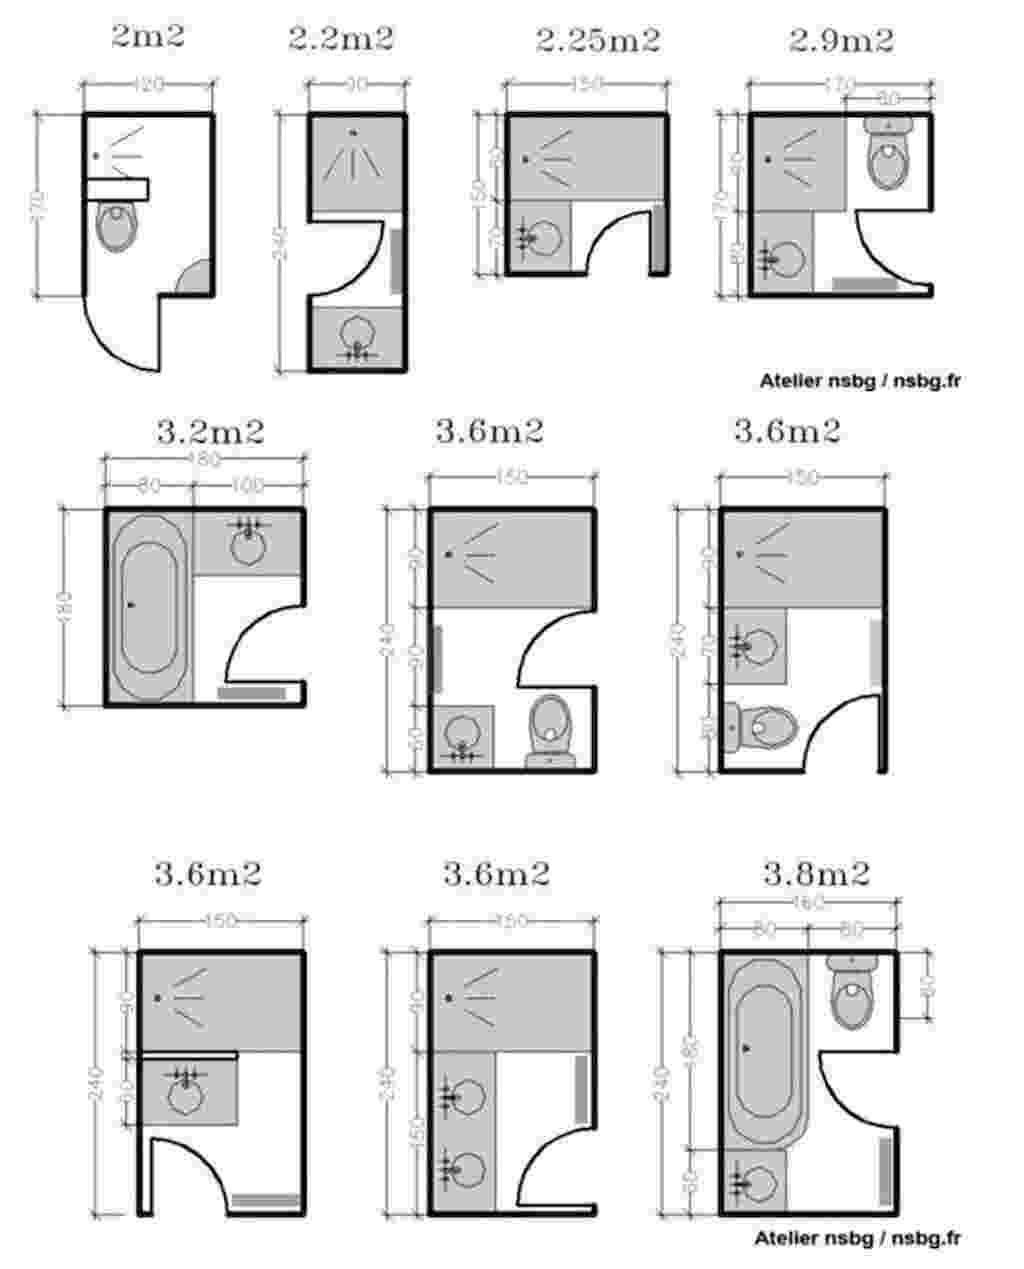 bathroom colours ideas designs 7 creative ideas for bathroom towel storage midcityeast bathroom colours designs ideas